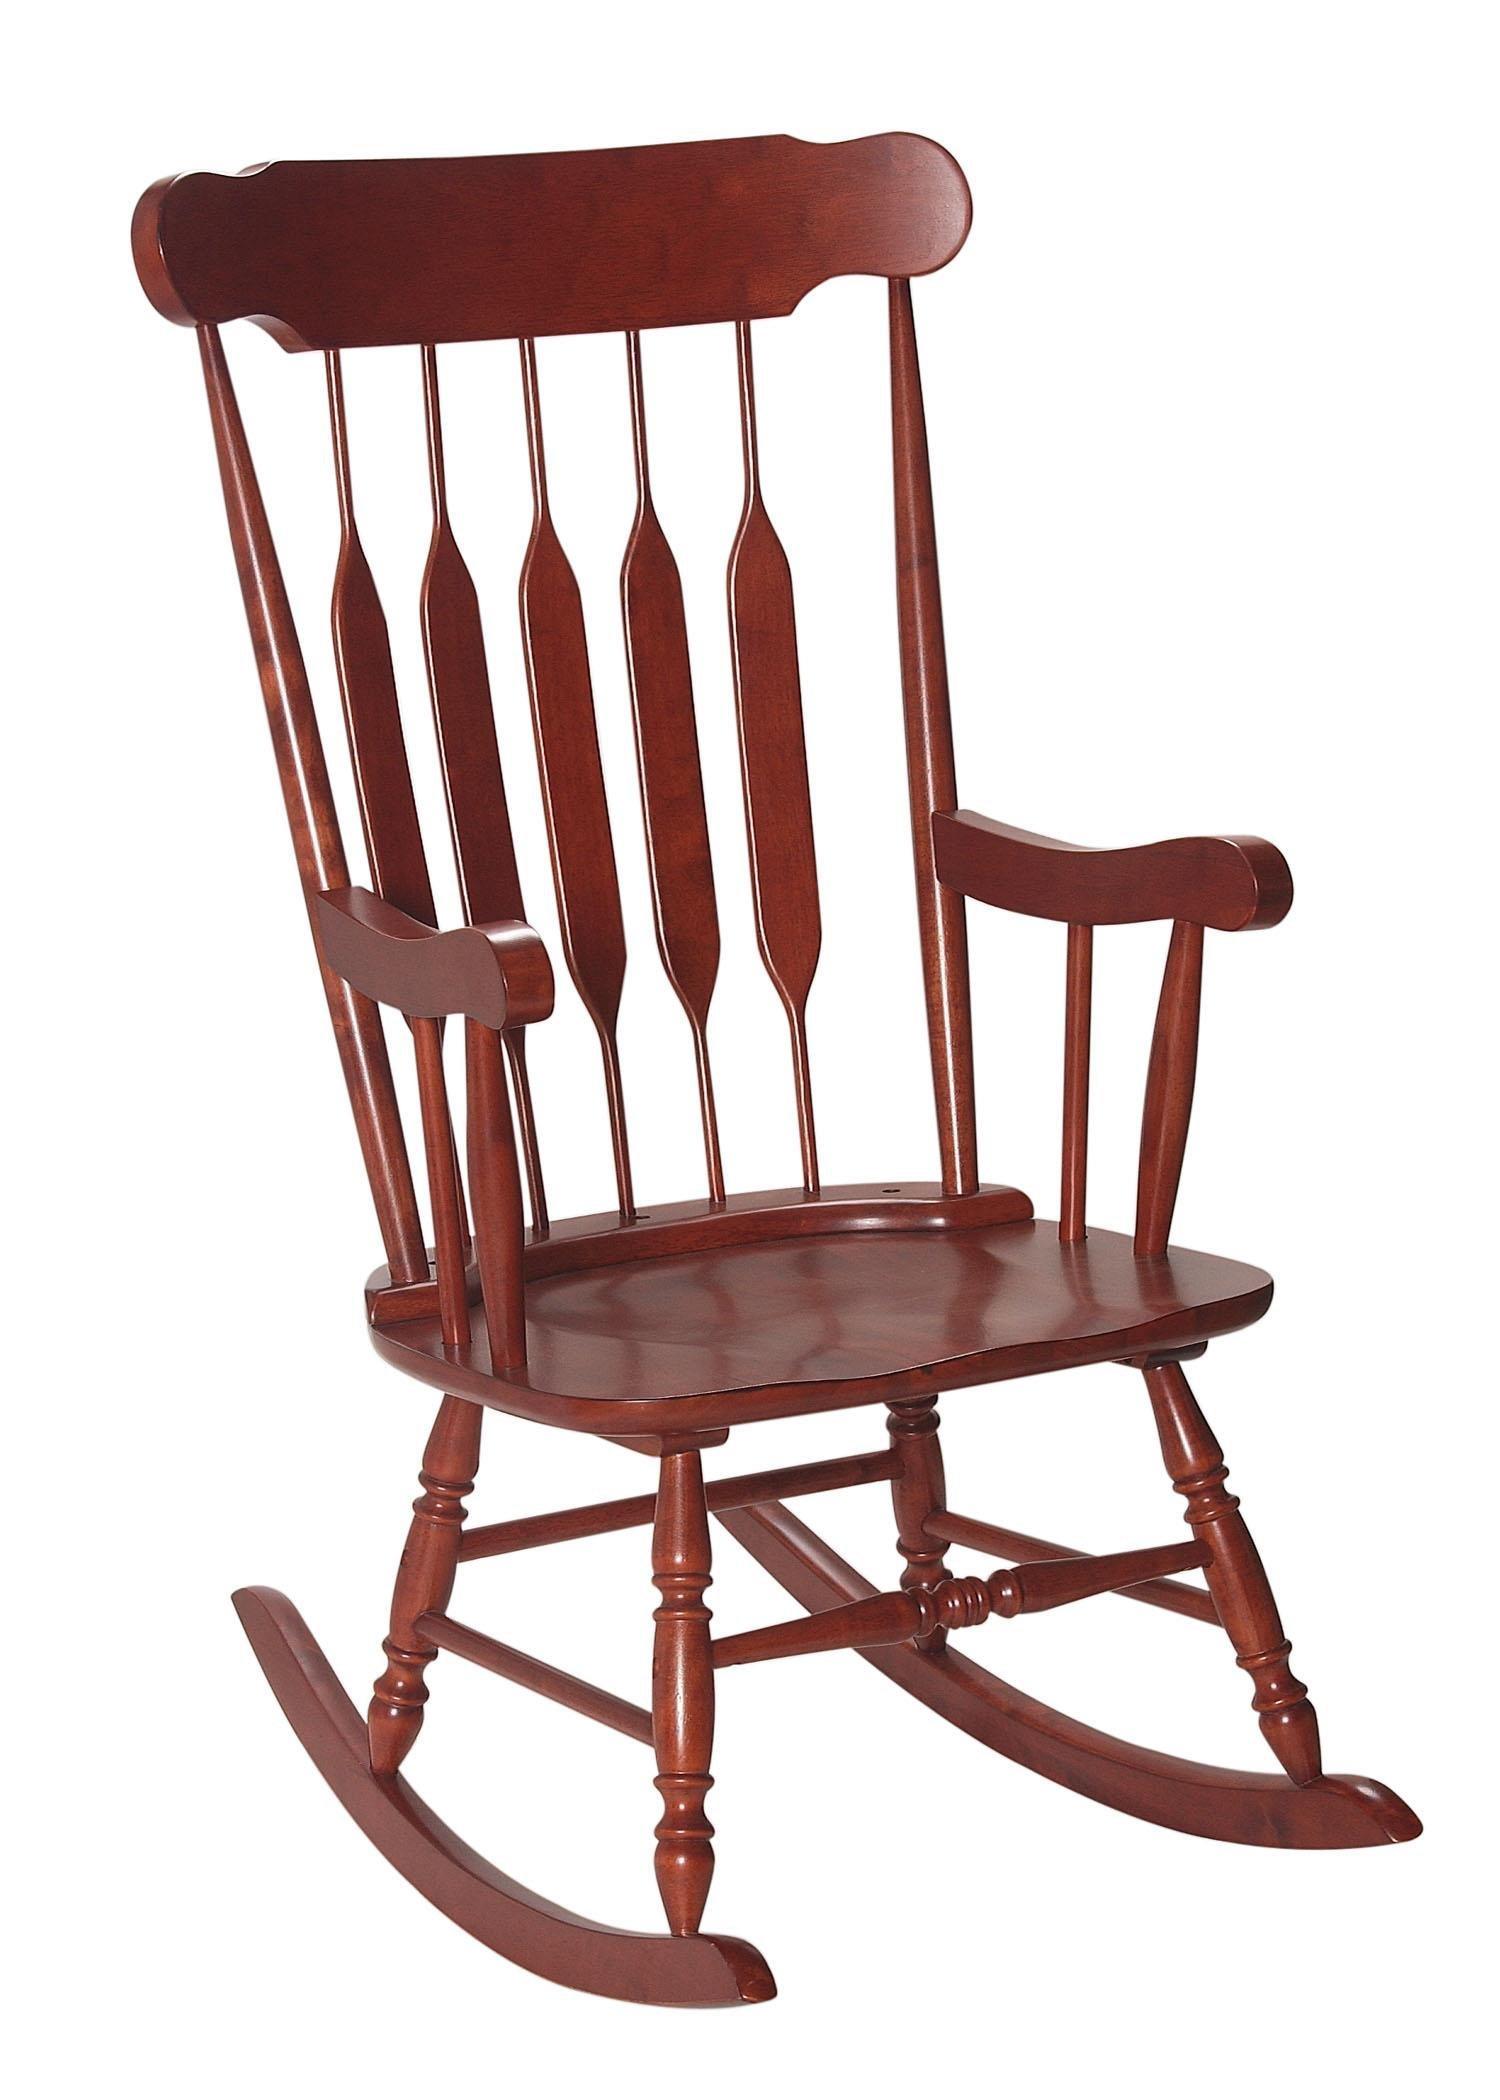 Giftmark 3800C Adult Rocking Chair - Cherry